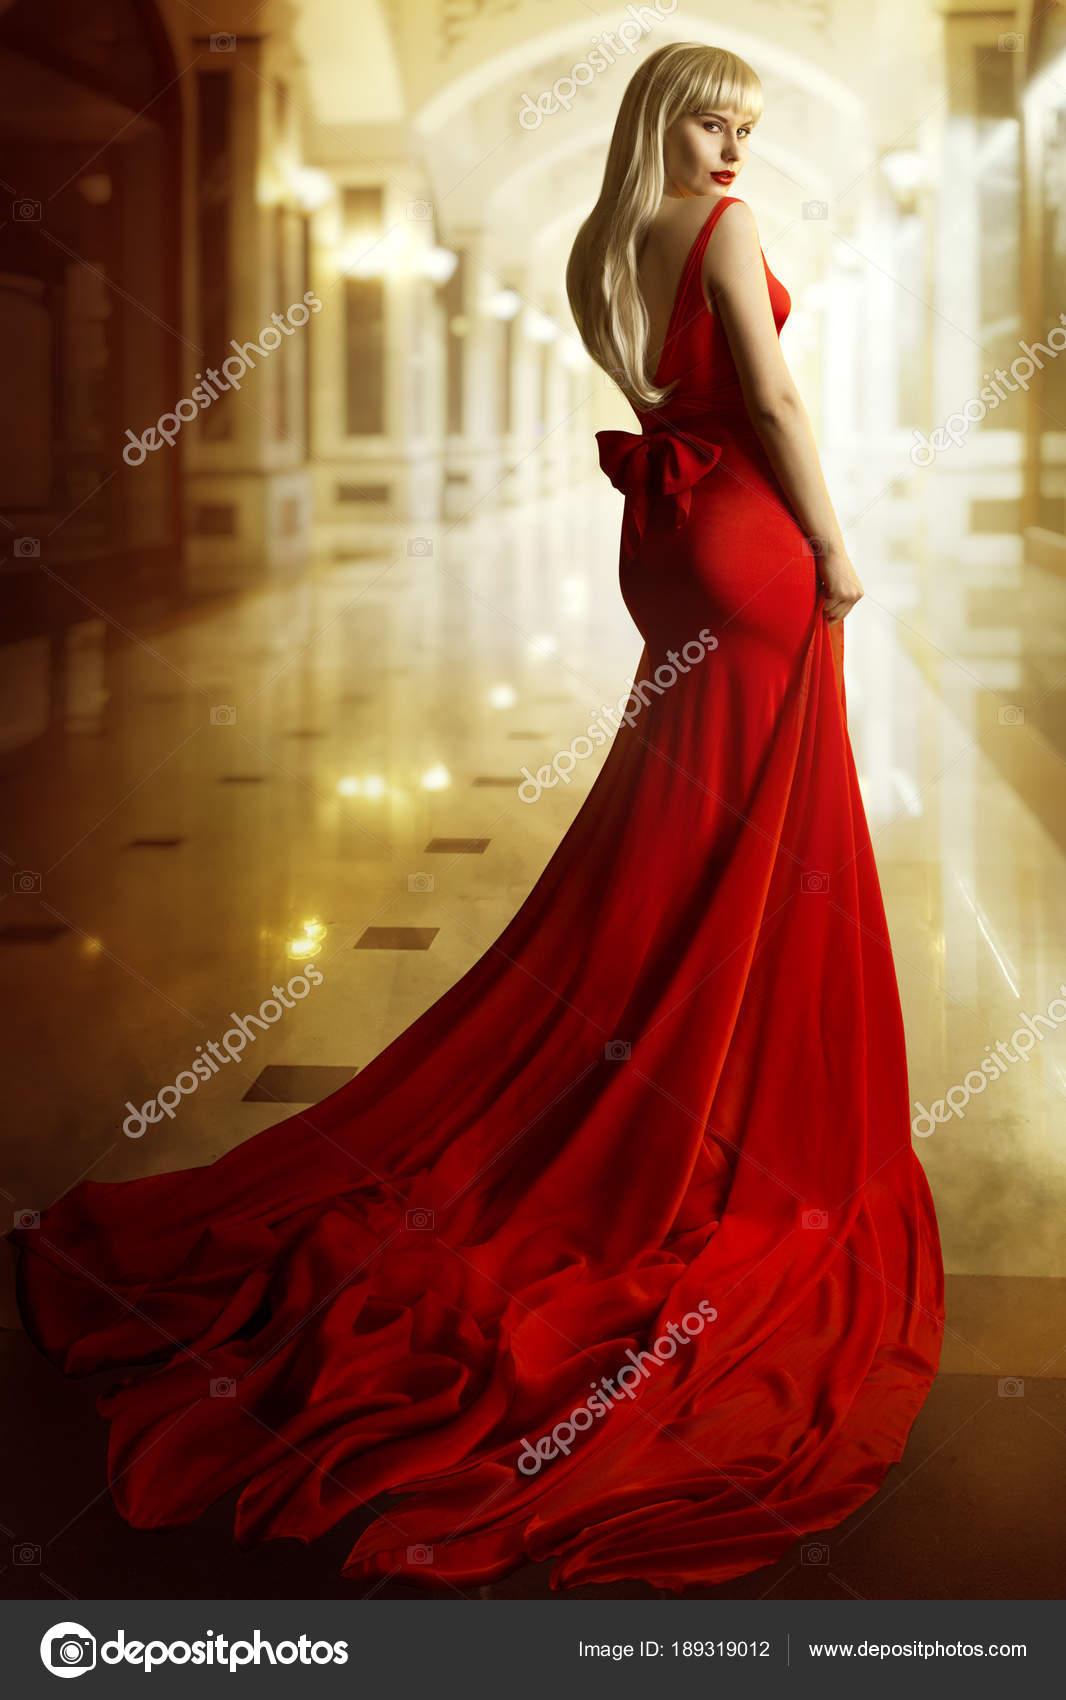 Mode Modell rotes Kleid, Frau Beauty Portrait, elegante Sexy Mädchen ...